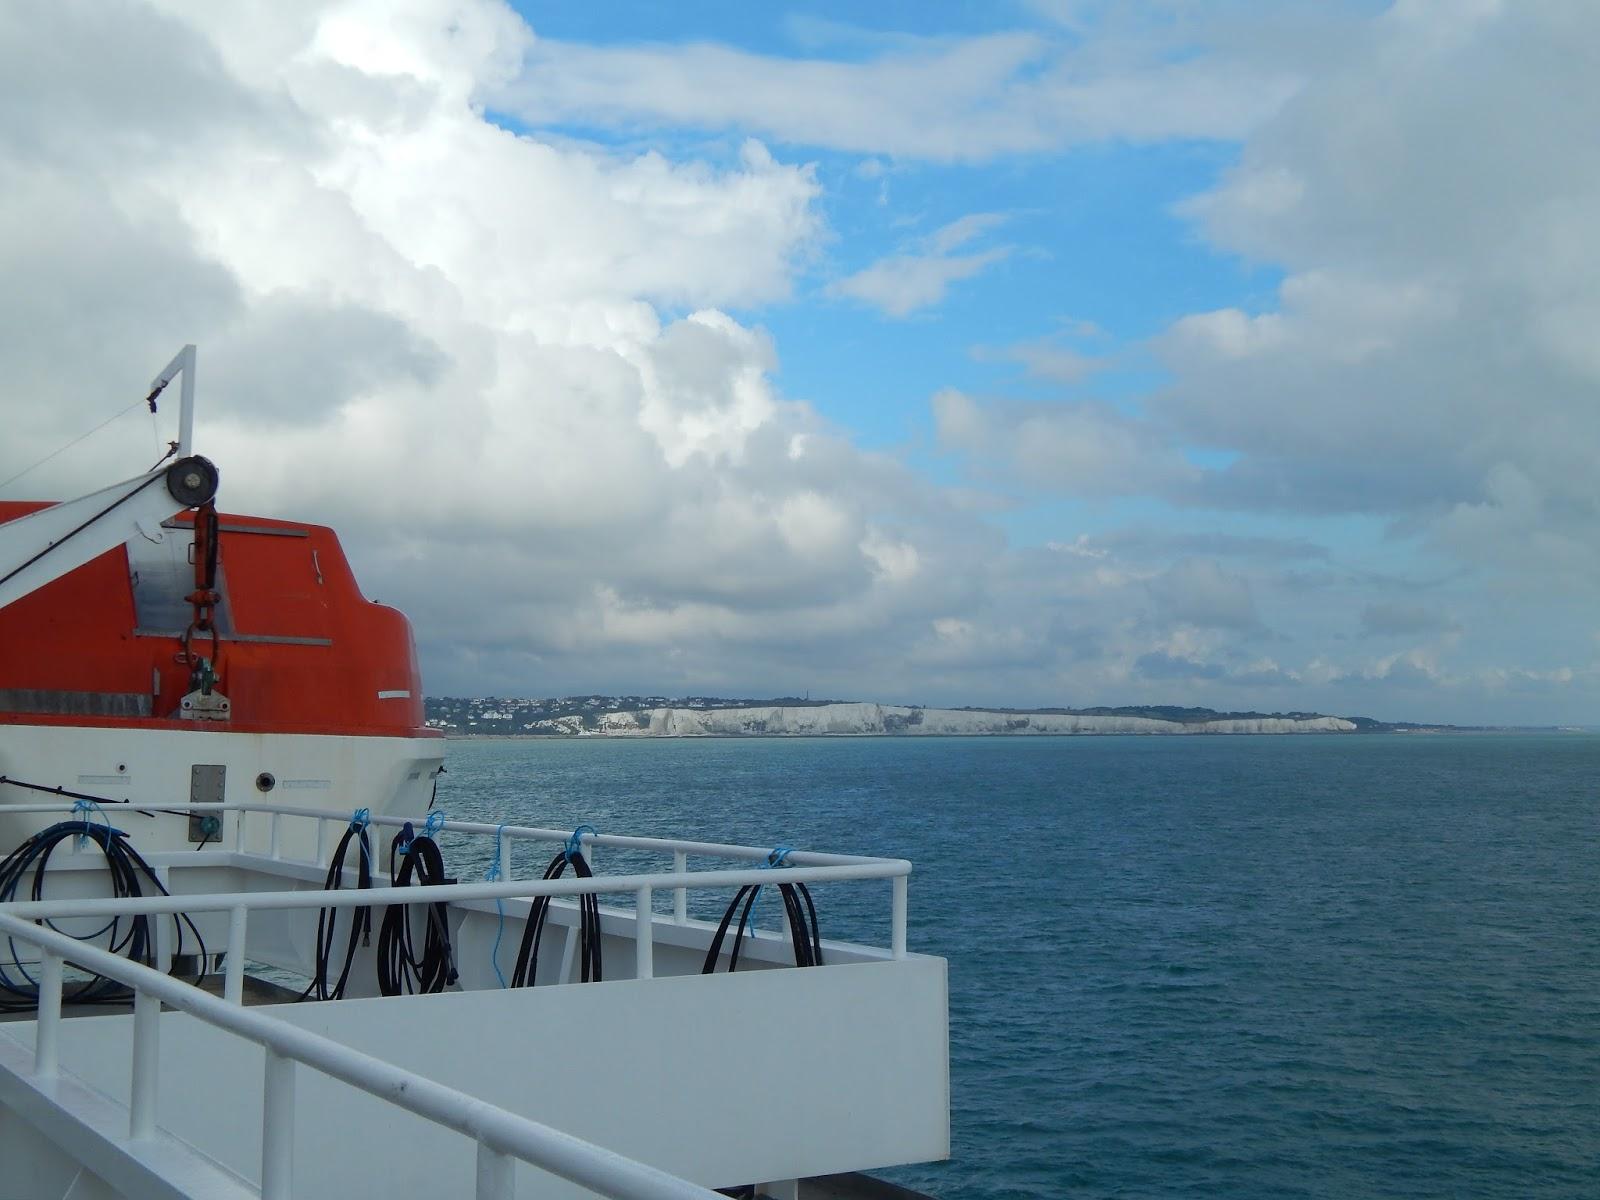 cesta trajektem přes La Manche